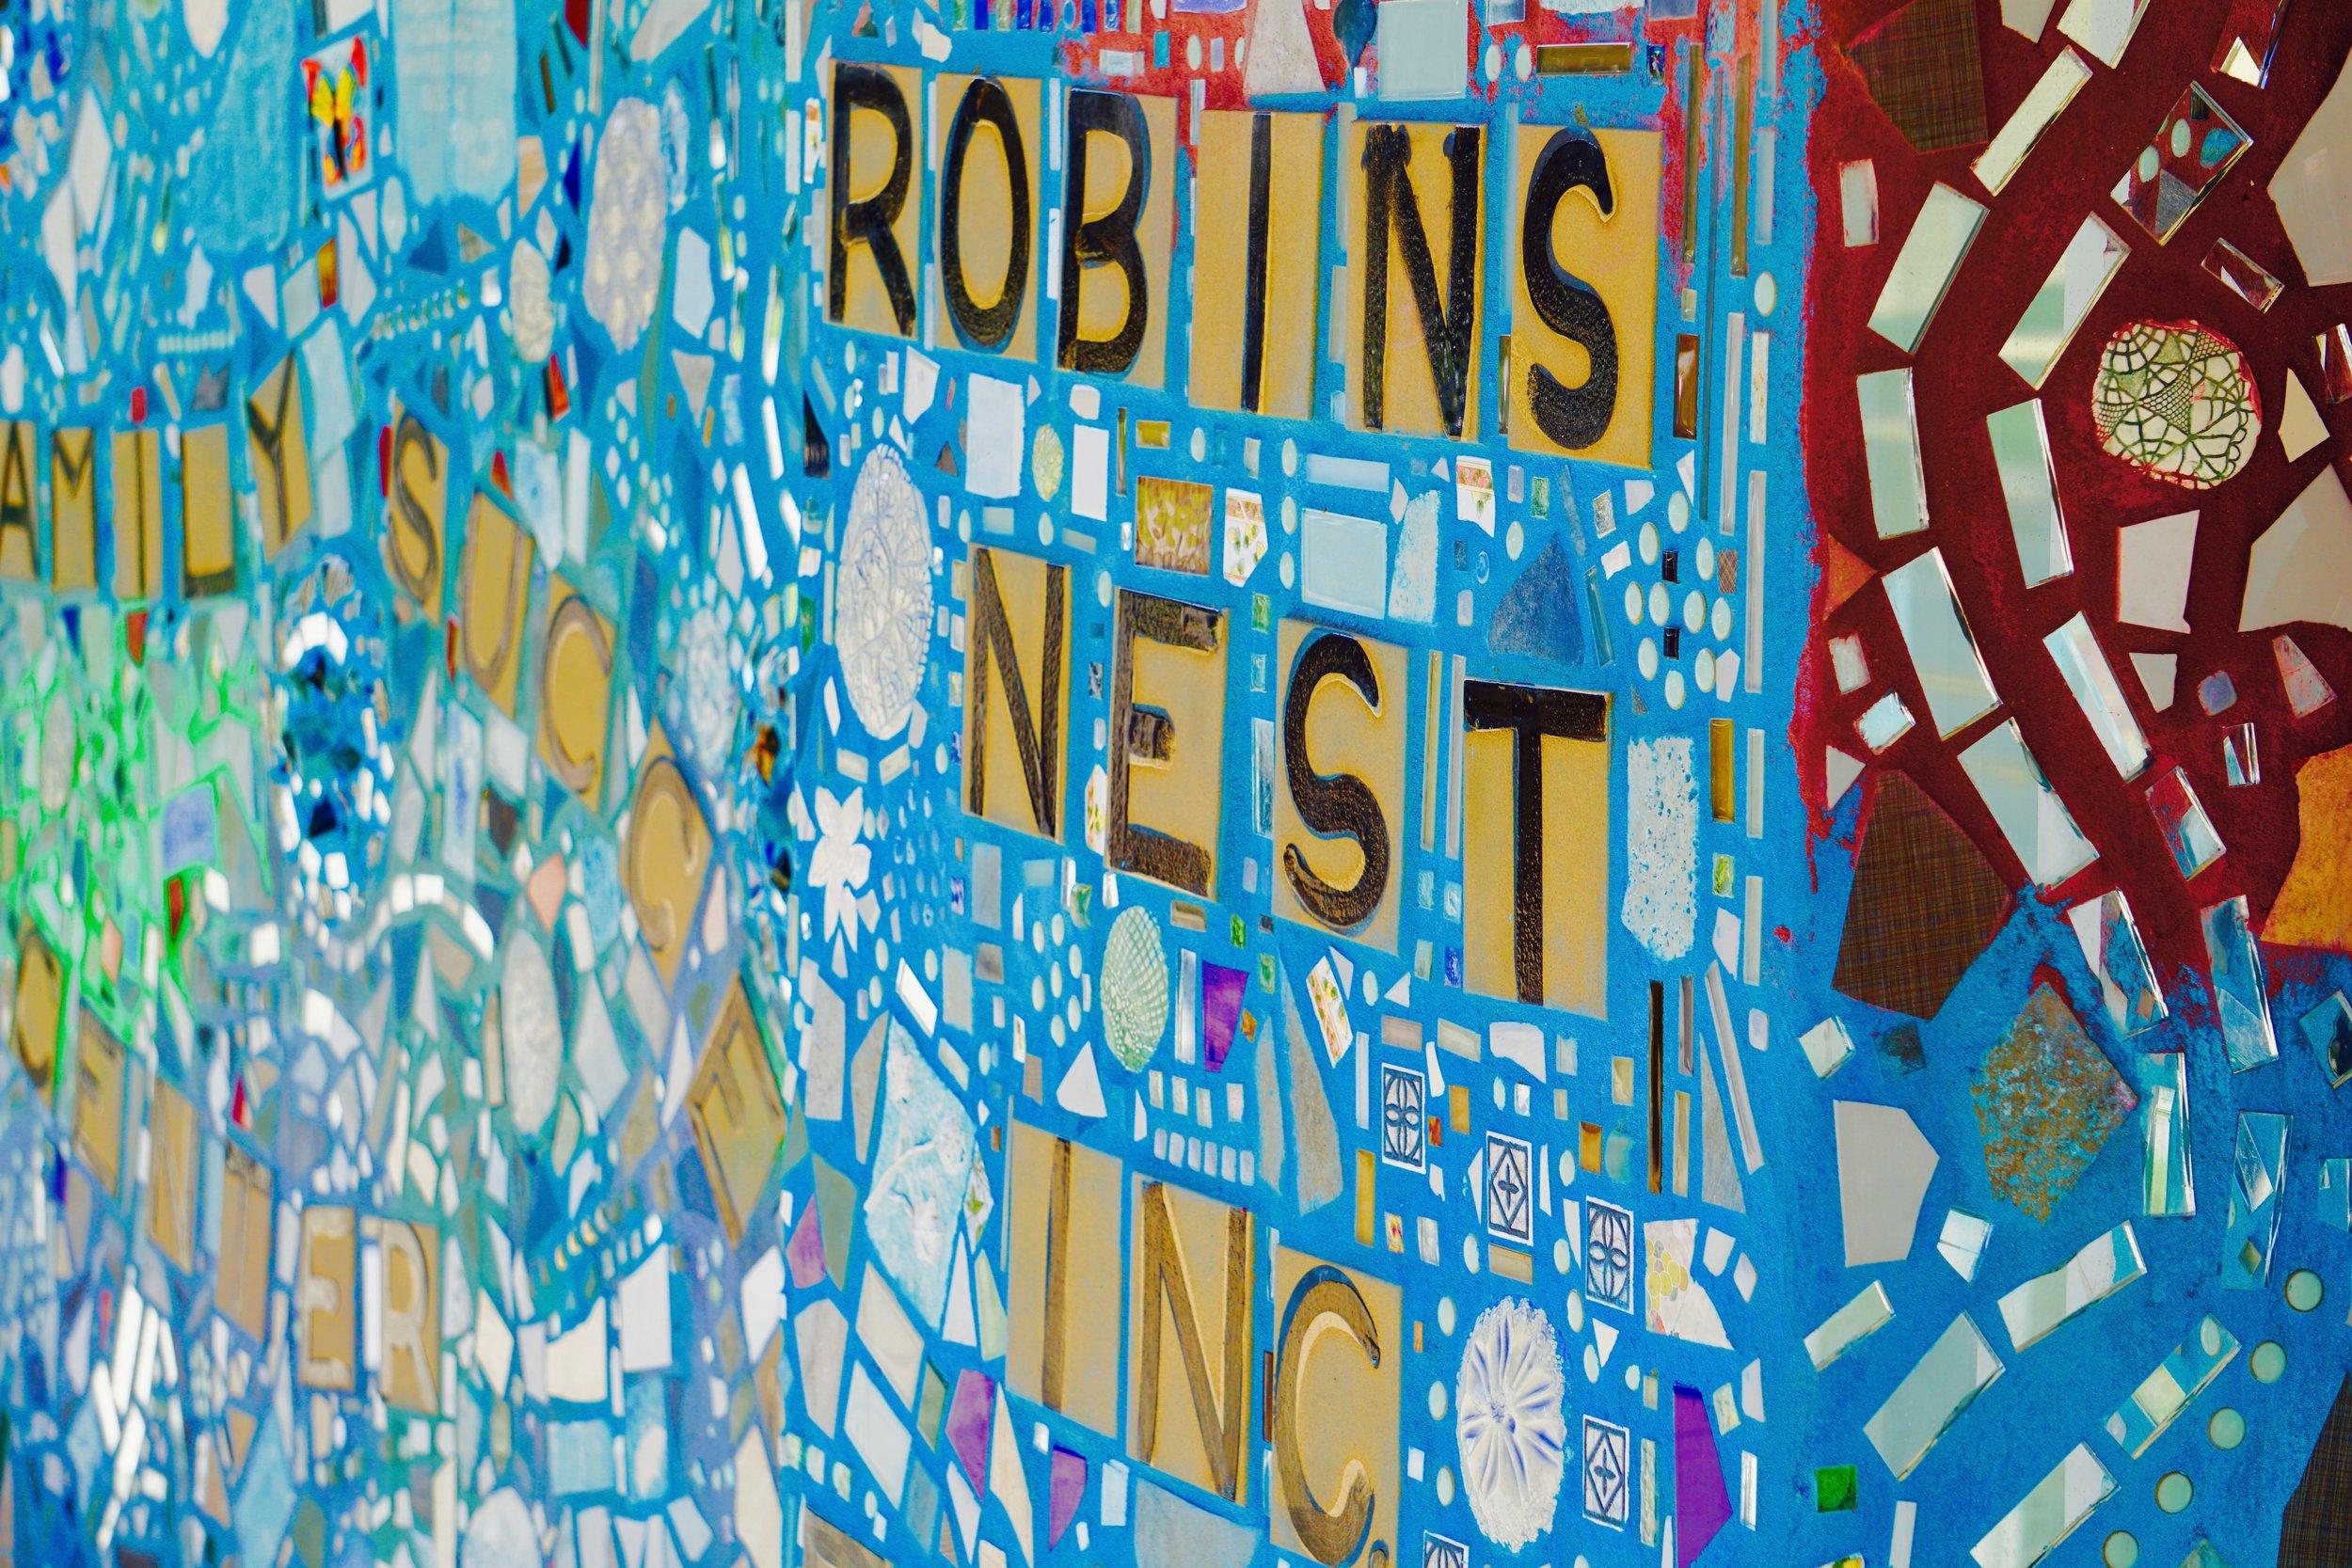 Isaiah Zagar Mosaic Mural for glassboro17.jpg